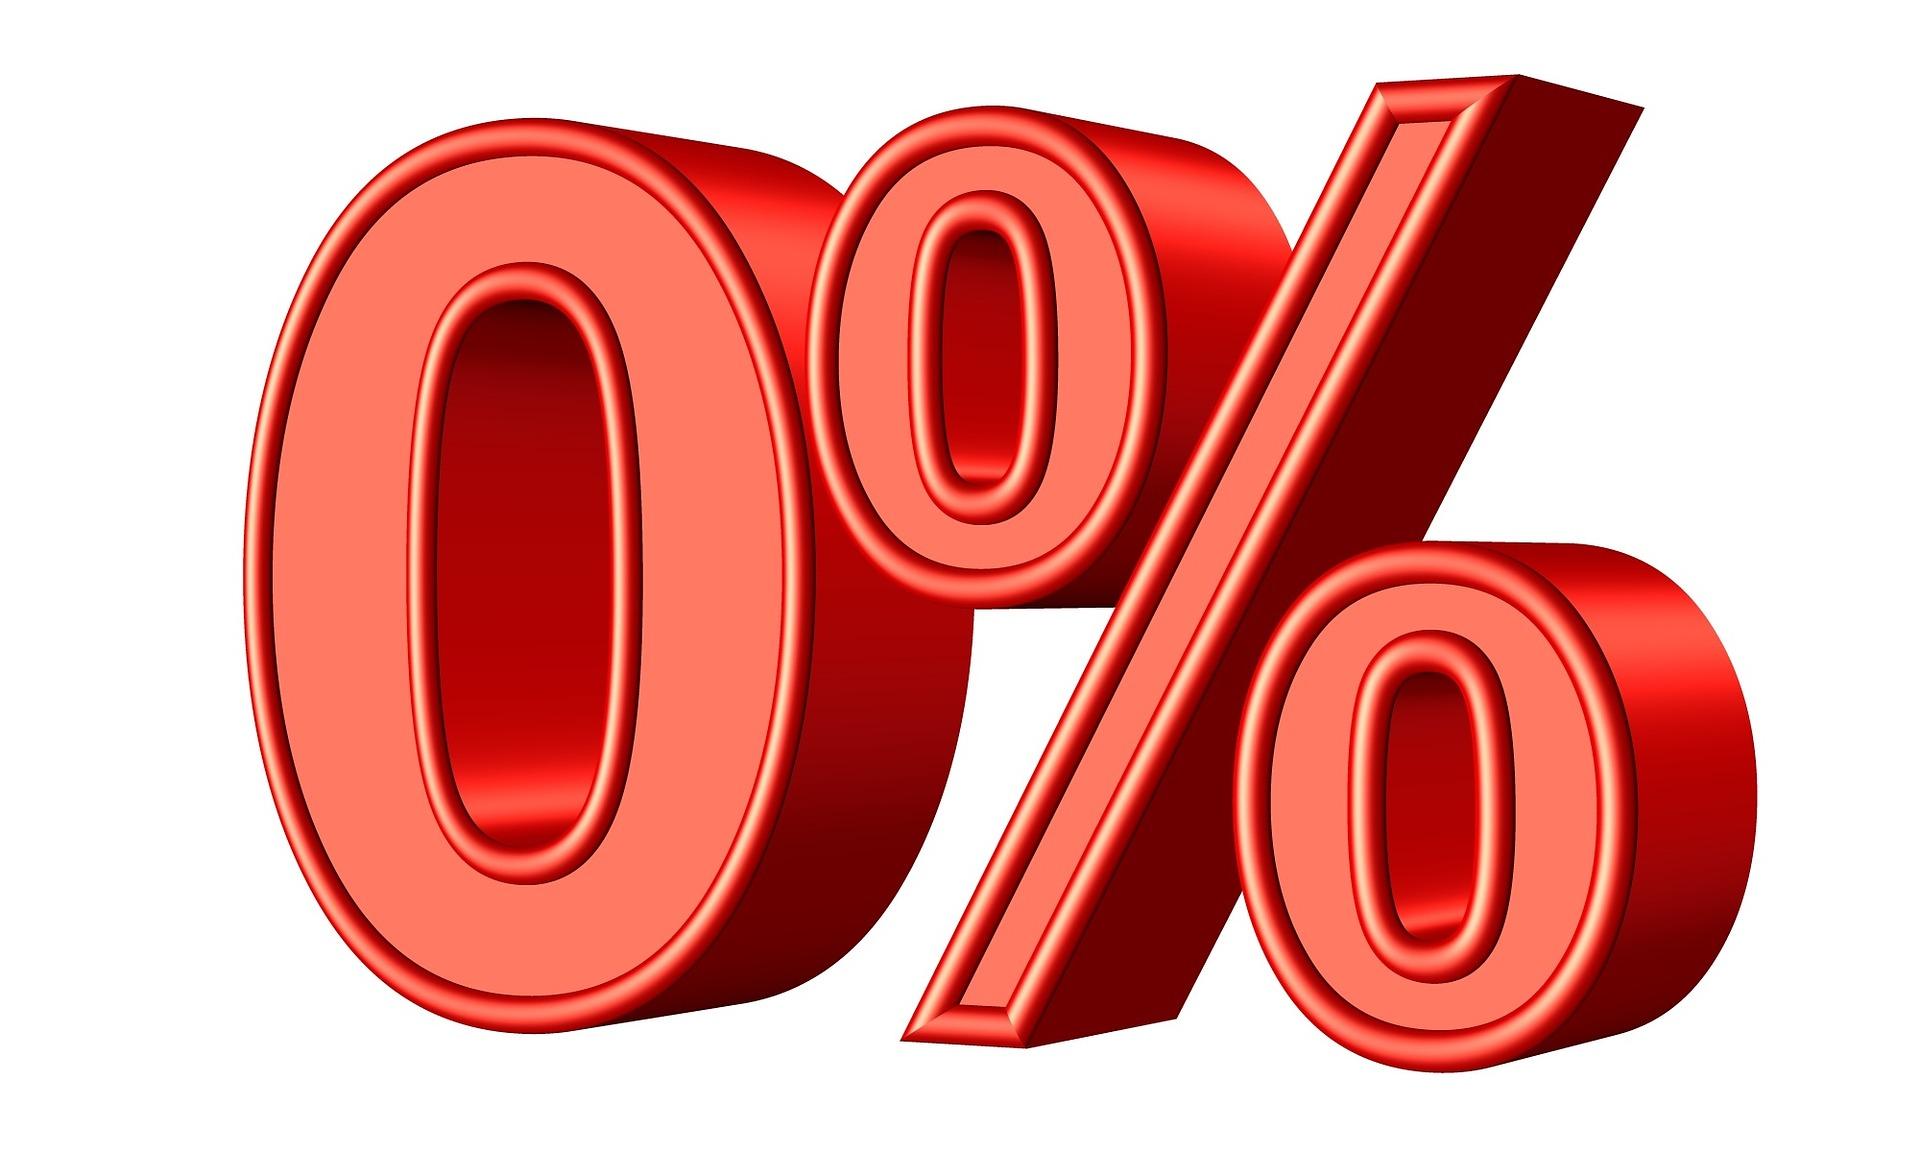 zajm-pod-0-procentov-na-kivi-koshelek_4